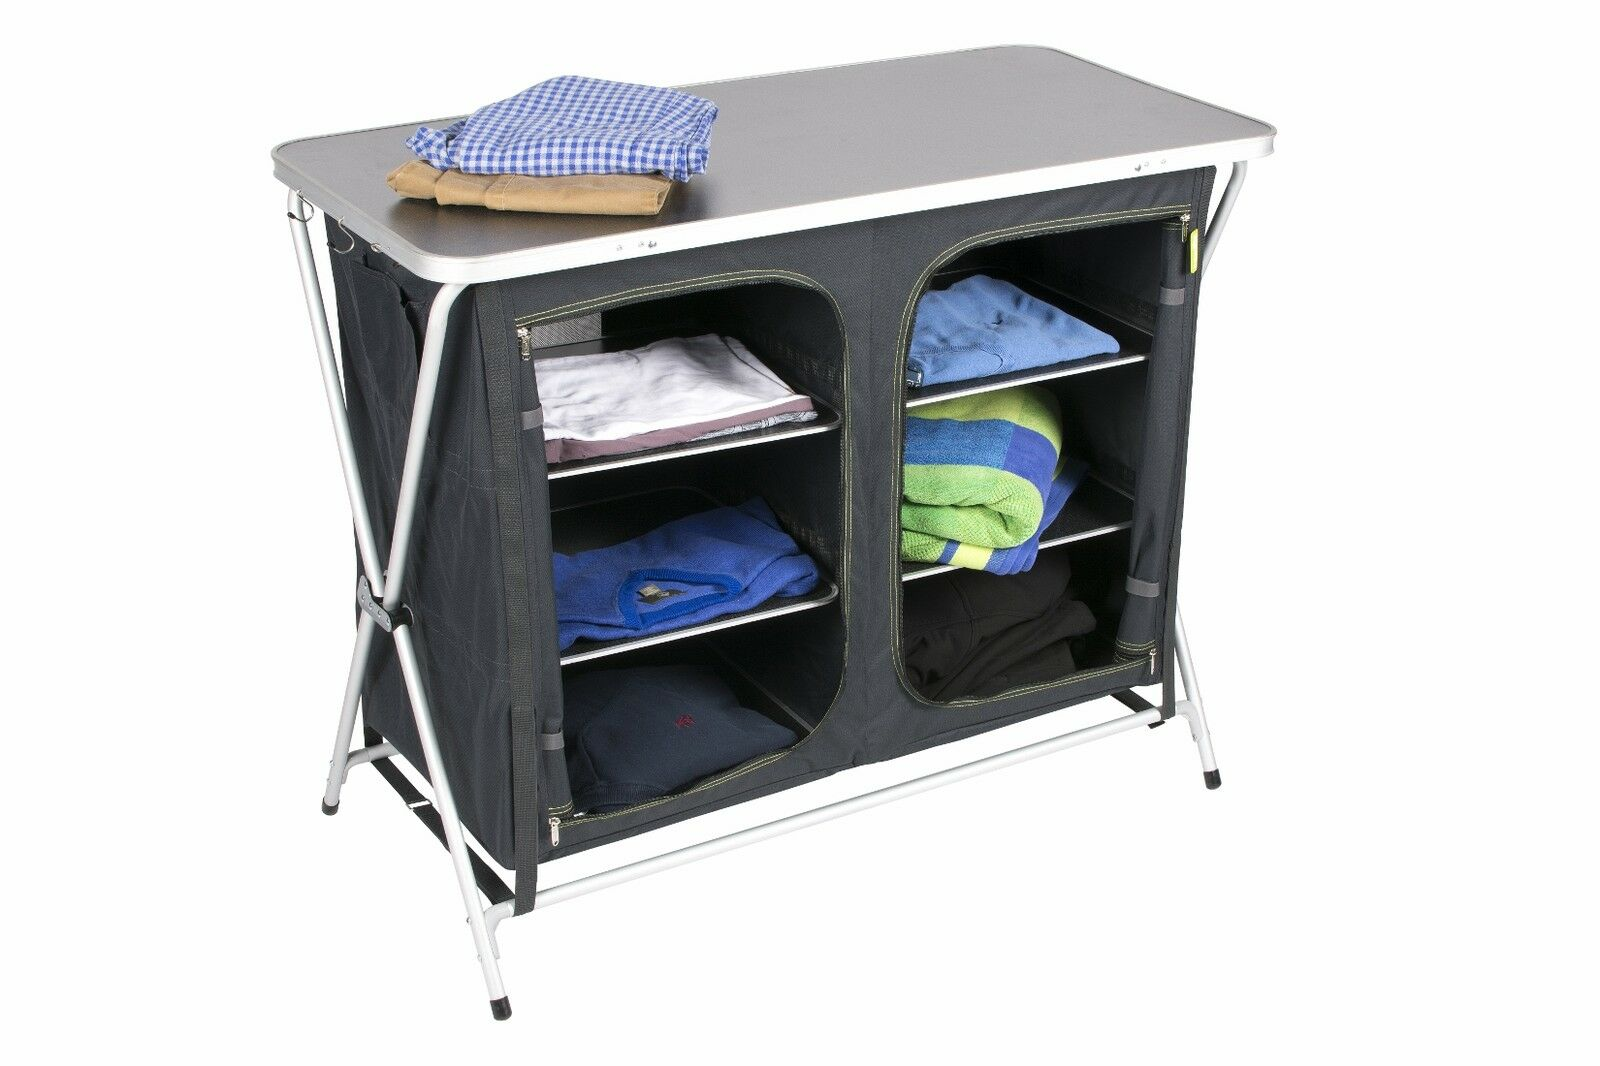 Xpress schnell faltbar Zelt Küchenschrank Speisekammer Camping Tisch Zara Kampa